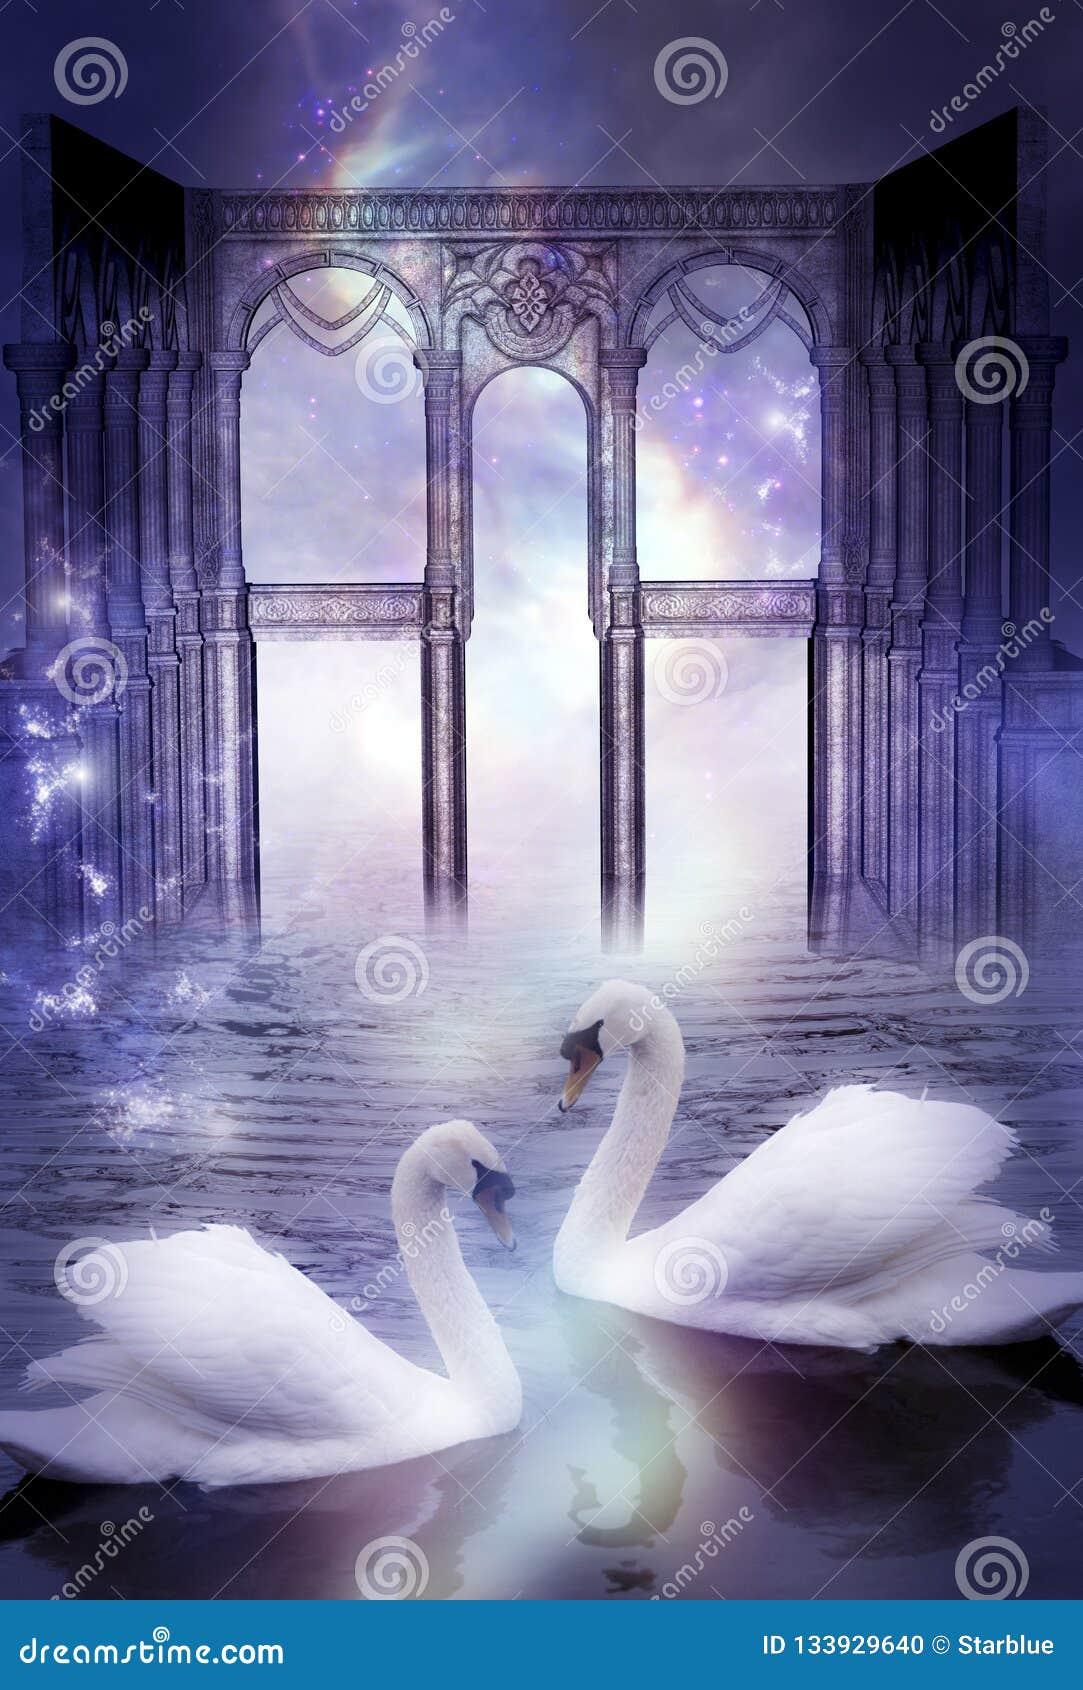 Cisnes místicos com porta divina como o conceito sonhador mágico surreal artístico